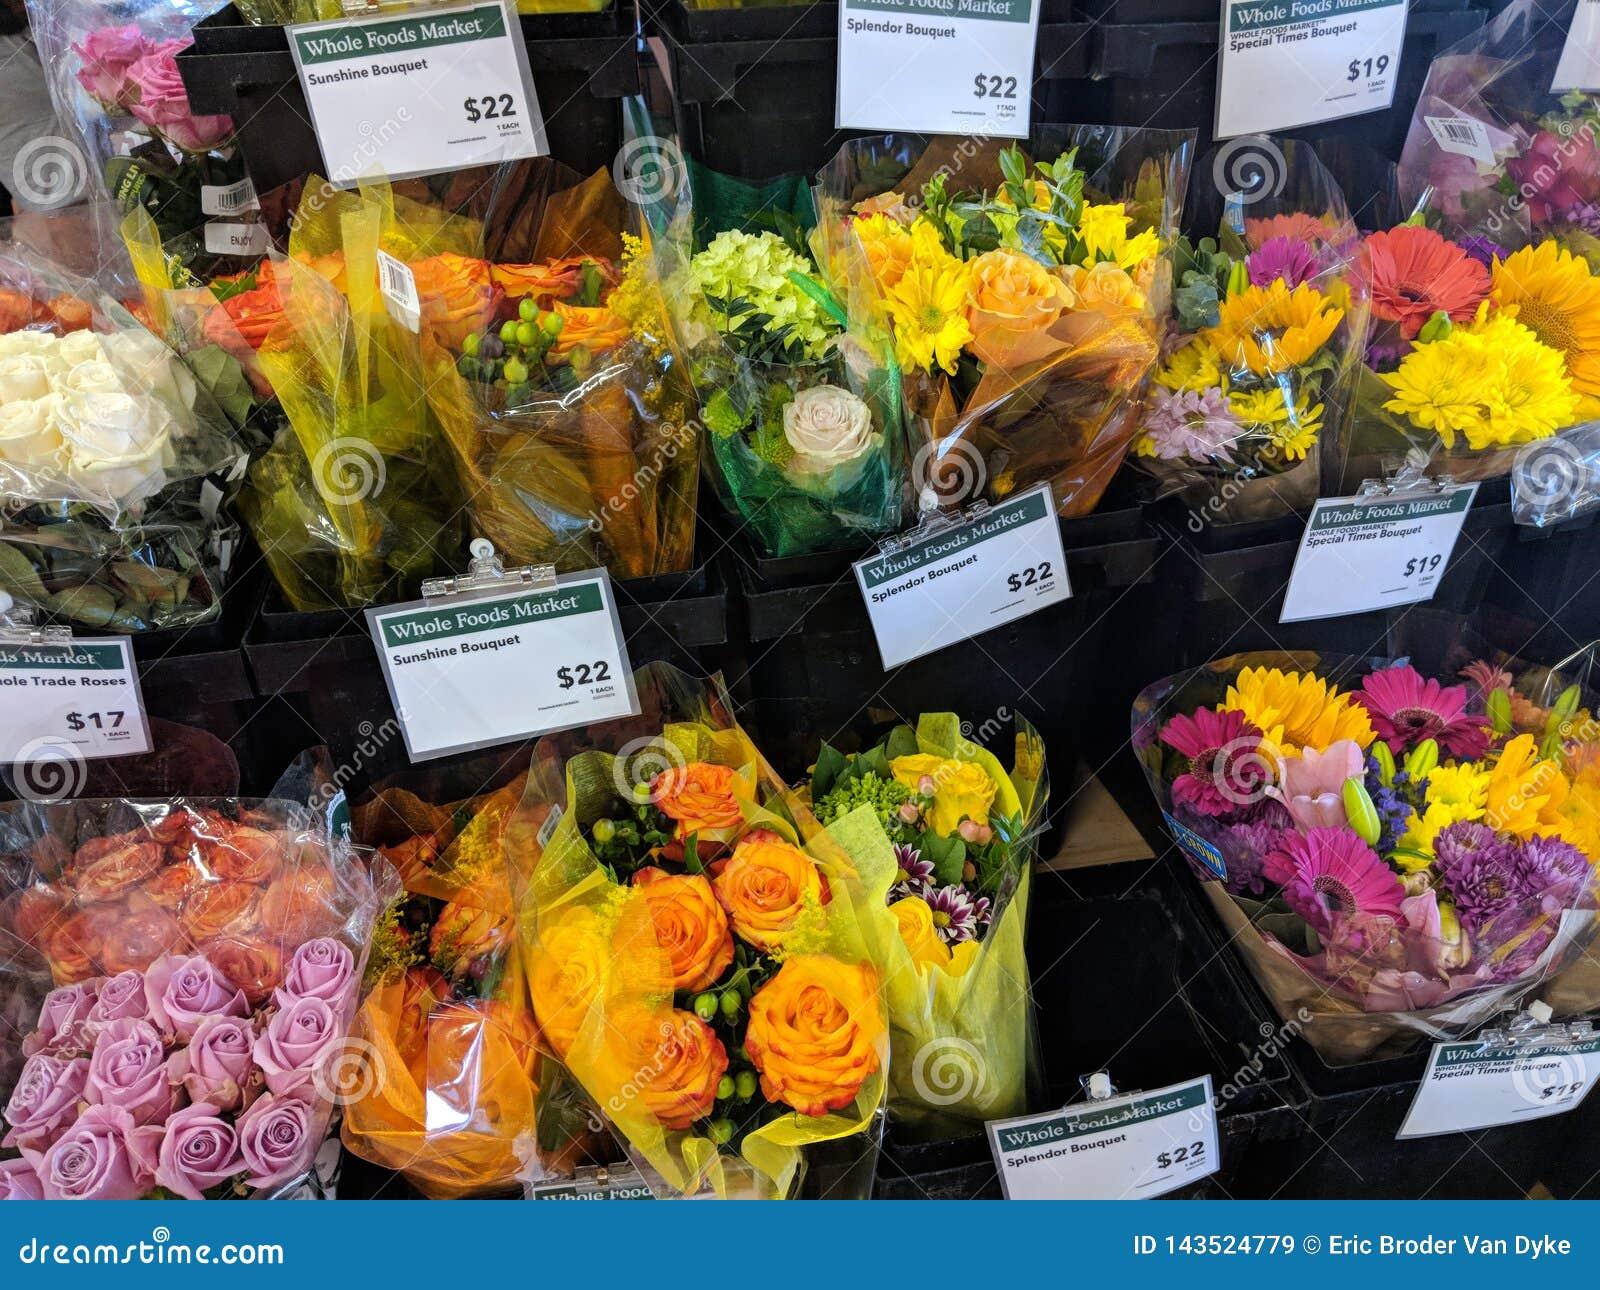 Flower Bouquet For Sale Inside Whole Foods Market Stock Image Image Of Date Eucalyptus 143524779